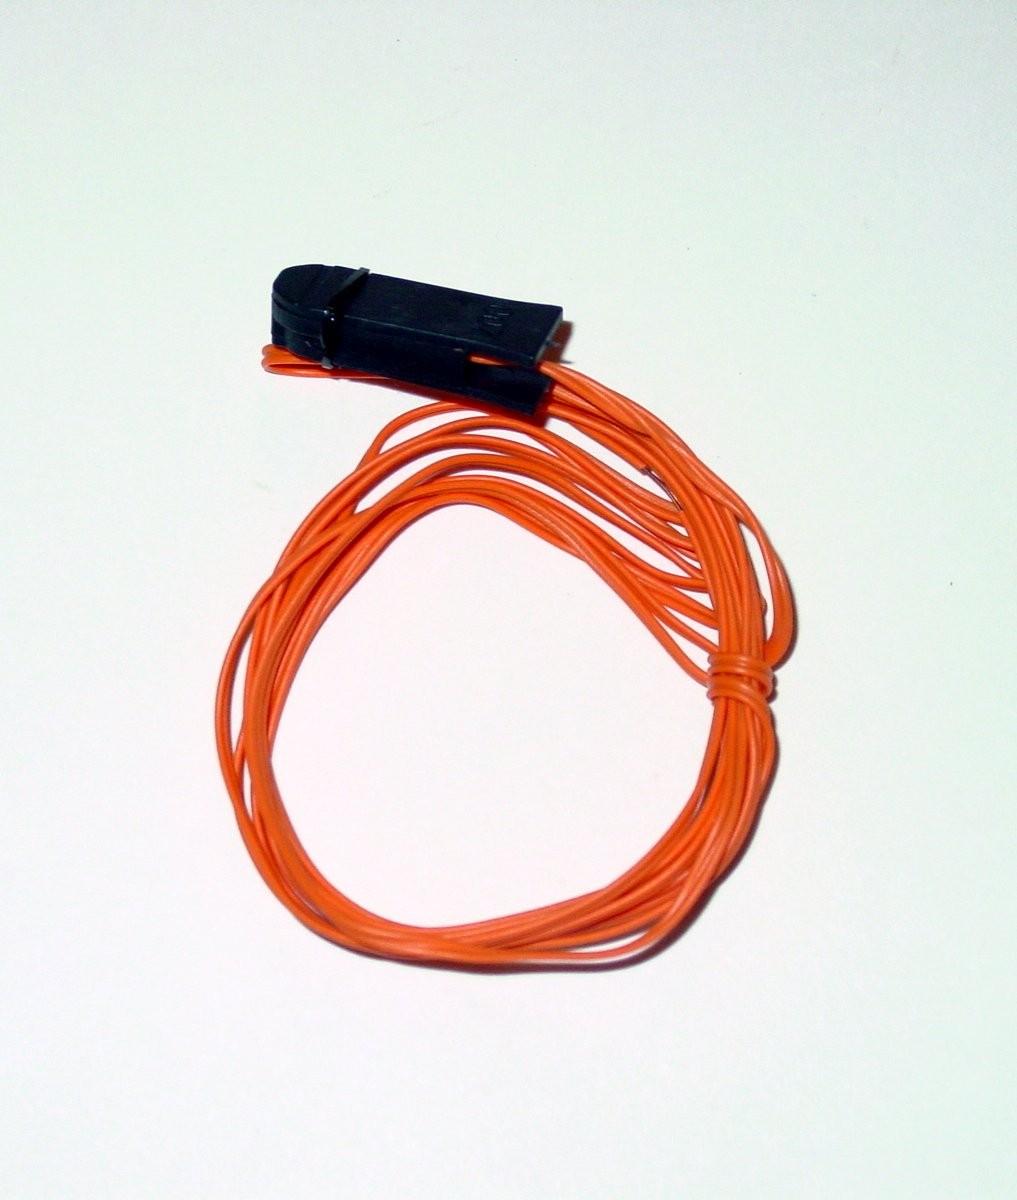 2M Talon Igniter (2 meter lead wires)